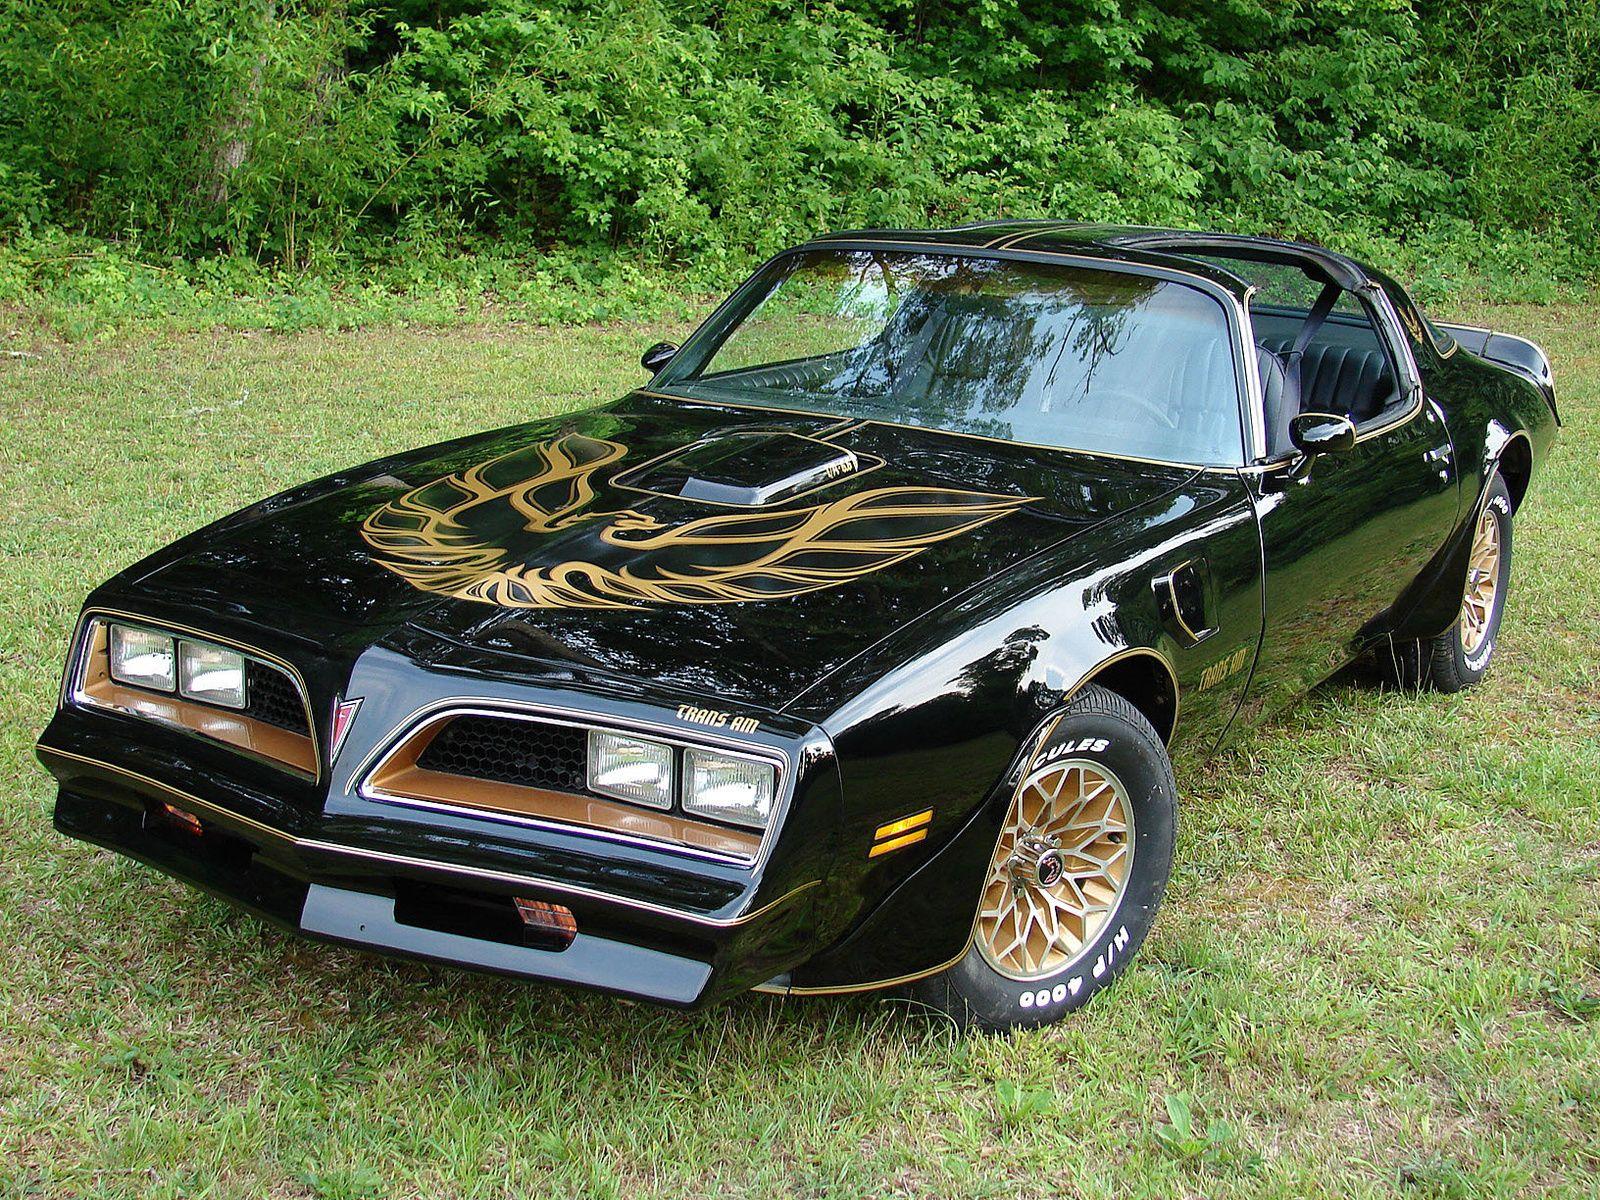 1978 Pontiac Trans Am Black and Gold Ttops Firebird car